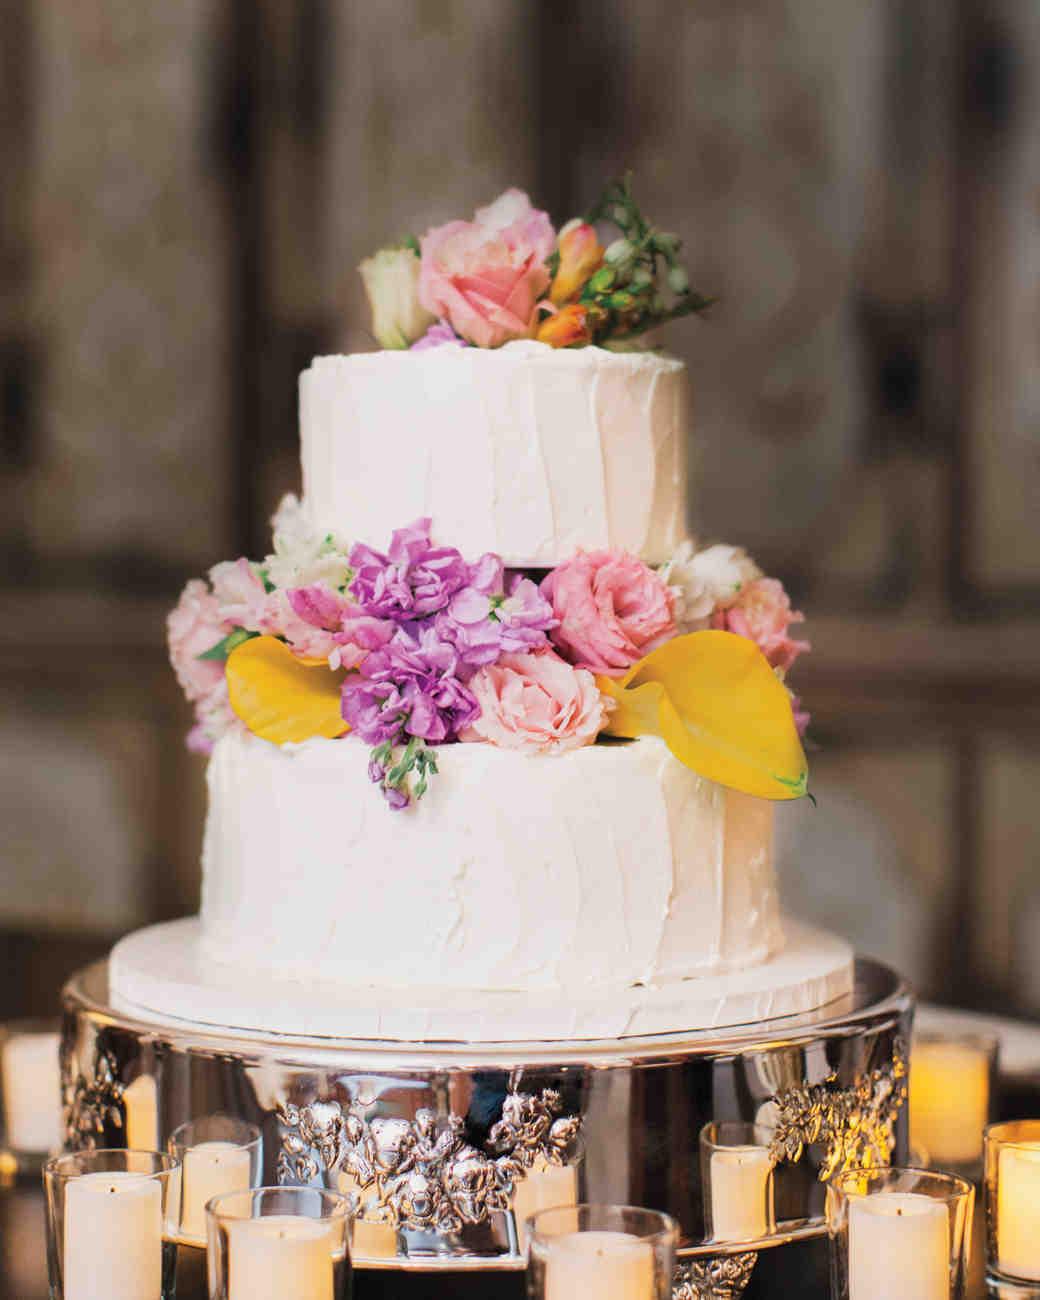 weddingcake-flowers-votivecandle-stjohnusvi-msw-3864-mwds110805.jpg